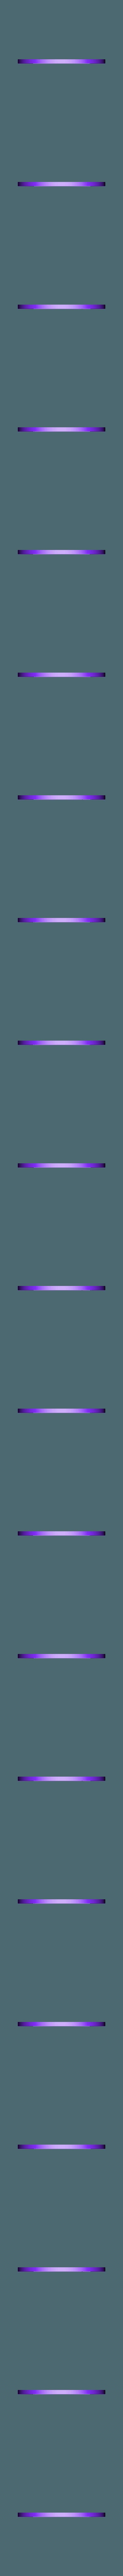 Kings_black.STL Download free STL file Minimal Multi-color NBA coasters • 3D print object, MosaicManufacturing